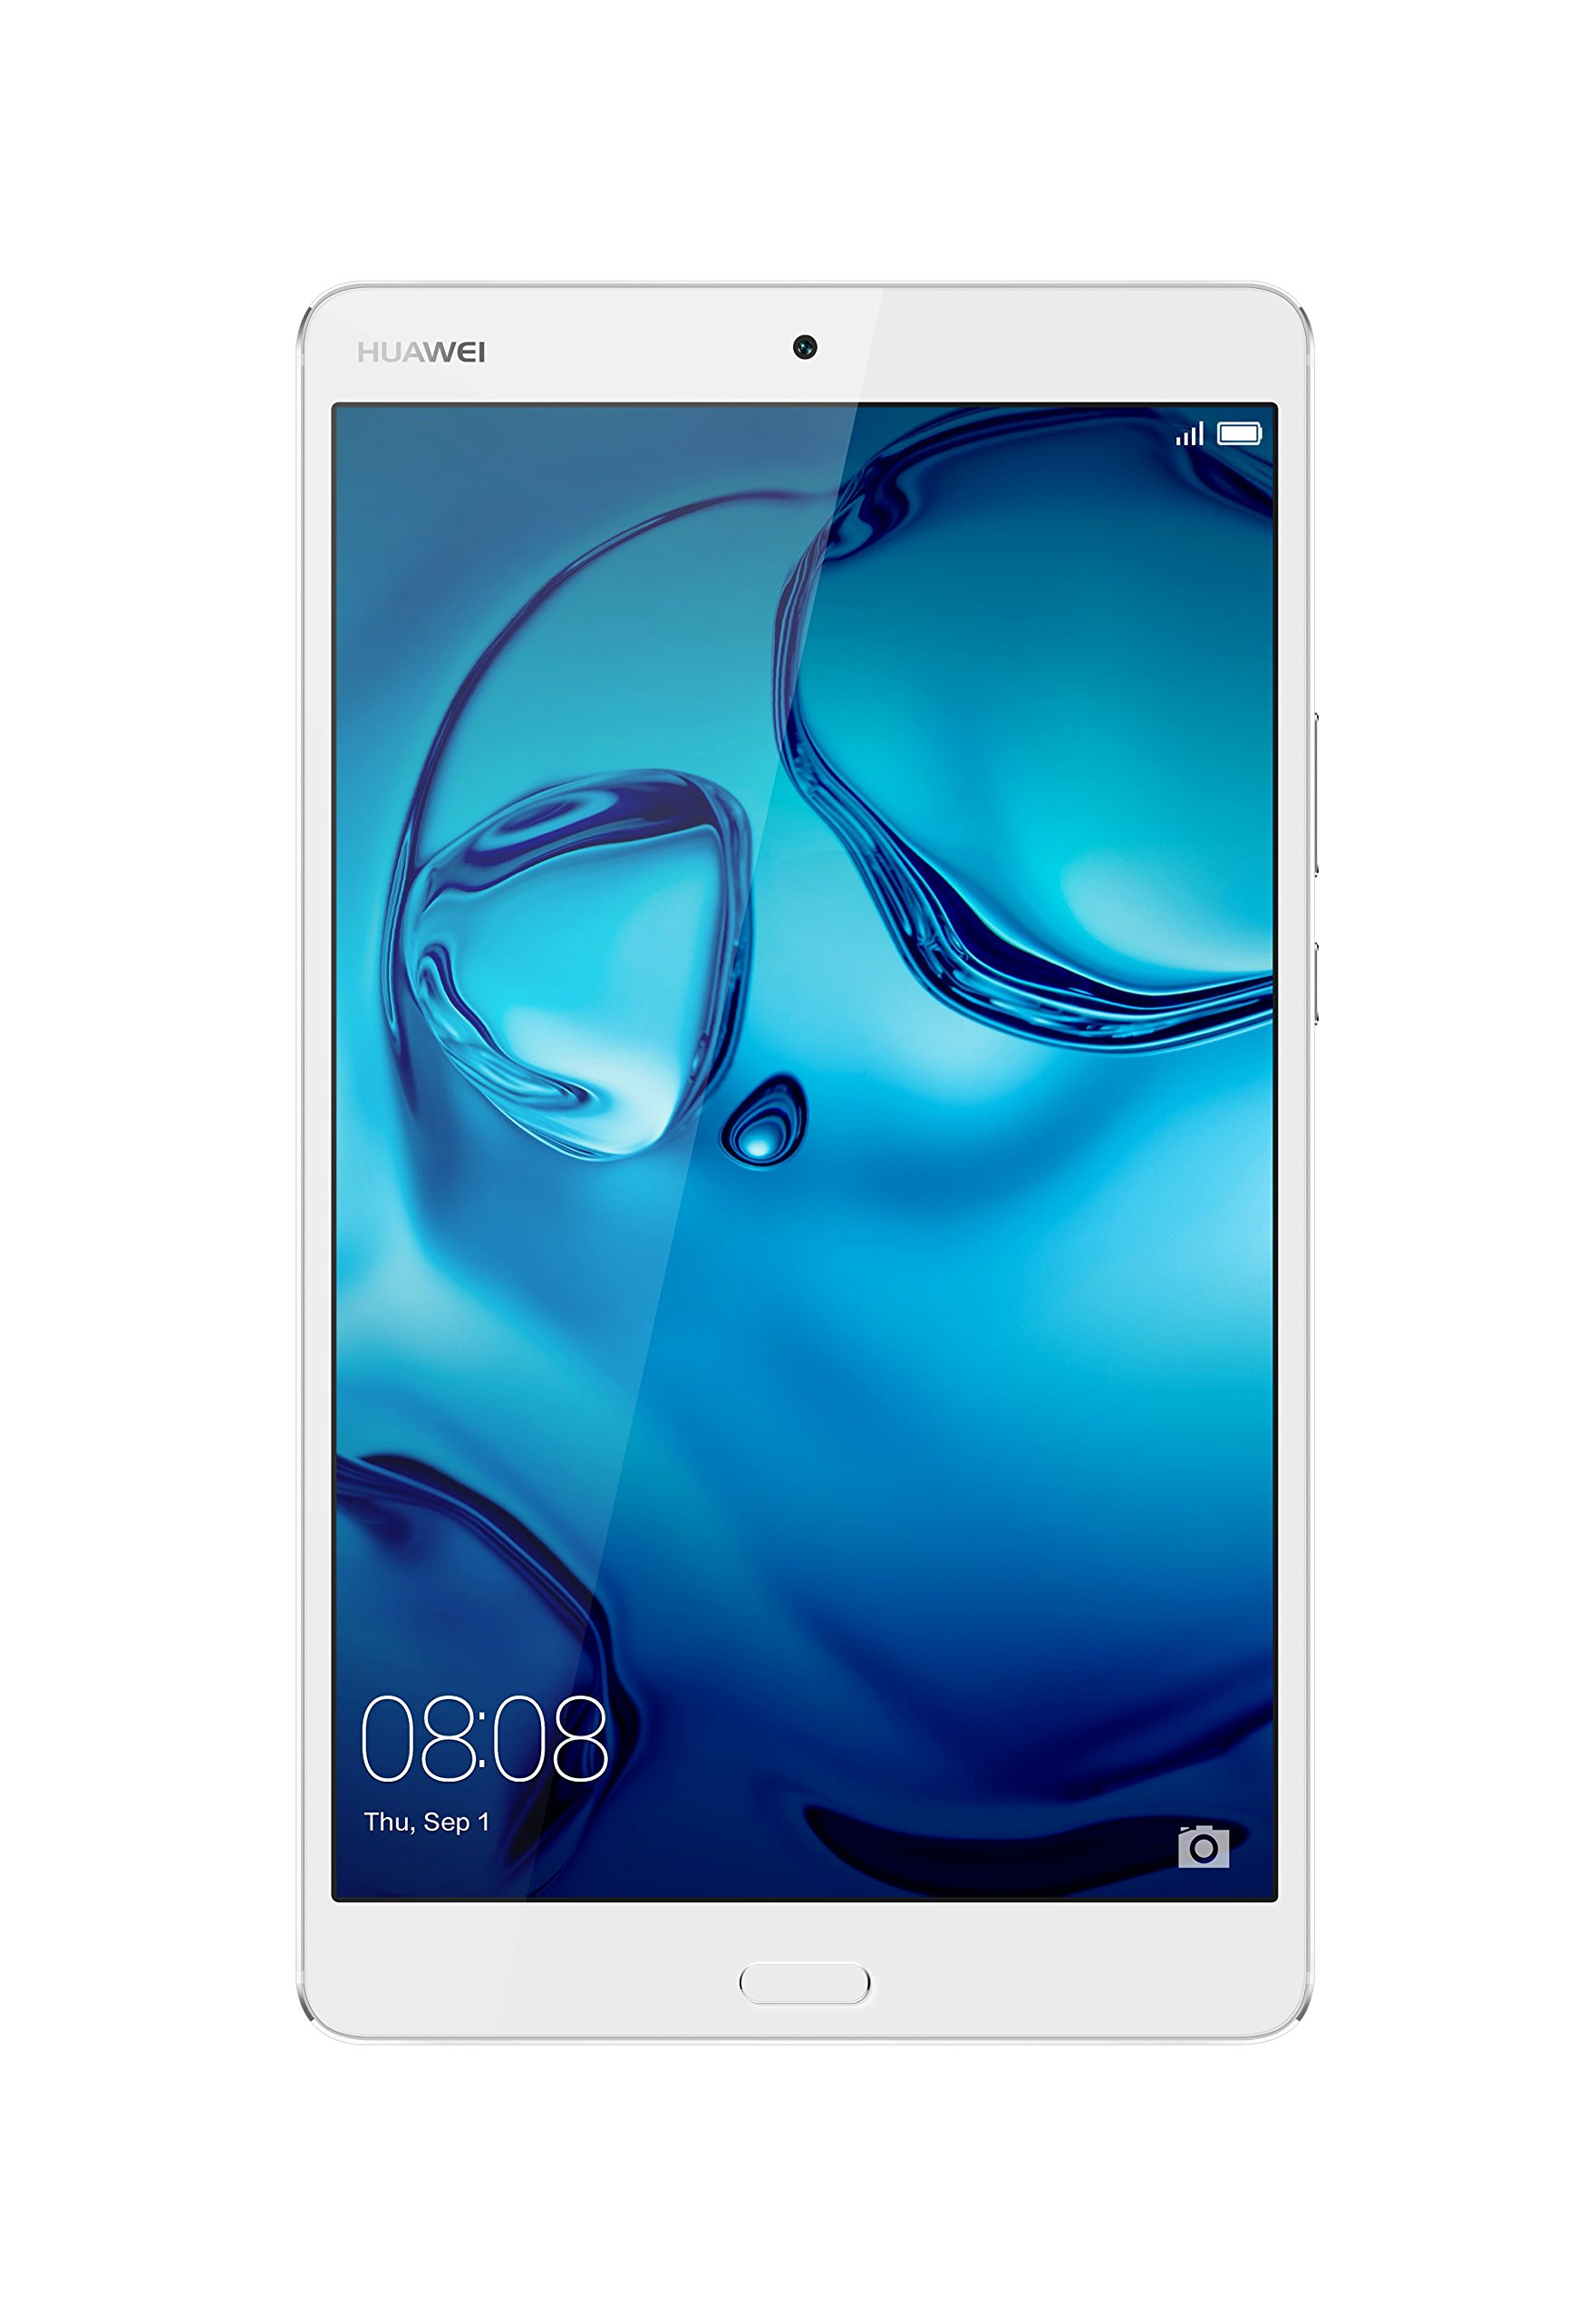 Huawei + Harman Kardon MediaPad M3 8.0 Octa Core 8.4'' Android (Marshmallow) +EMUI Tablet, WiFi only, 32GB, Moonlight Silver (US Warranty) by Huawei